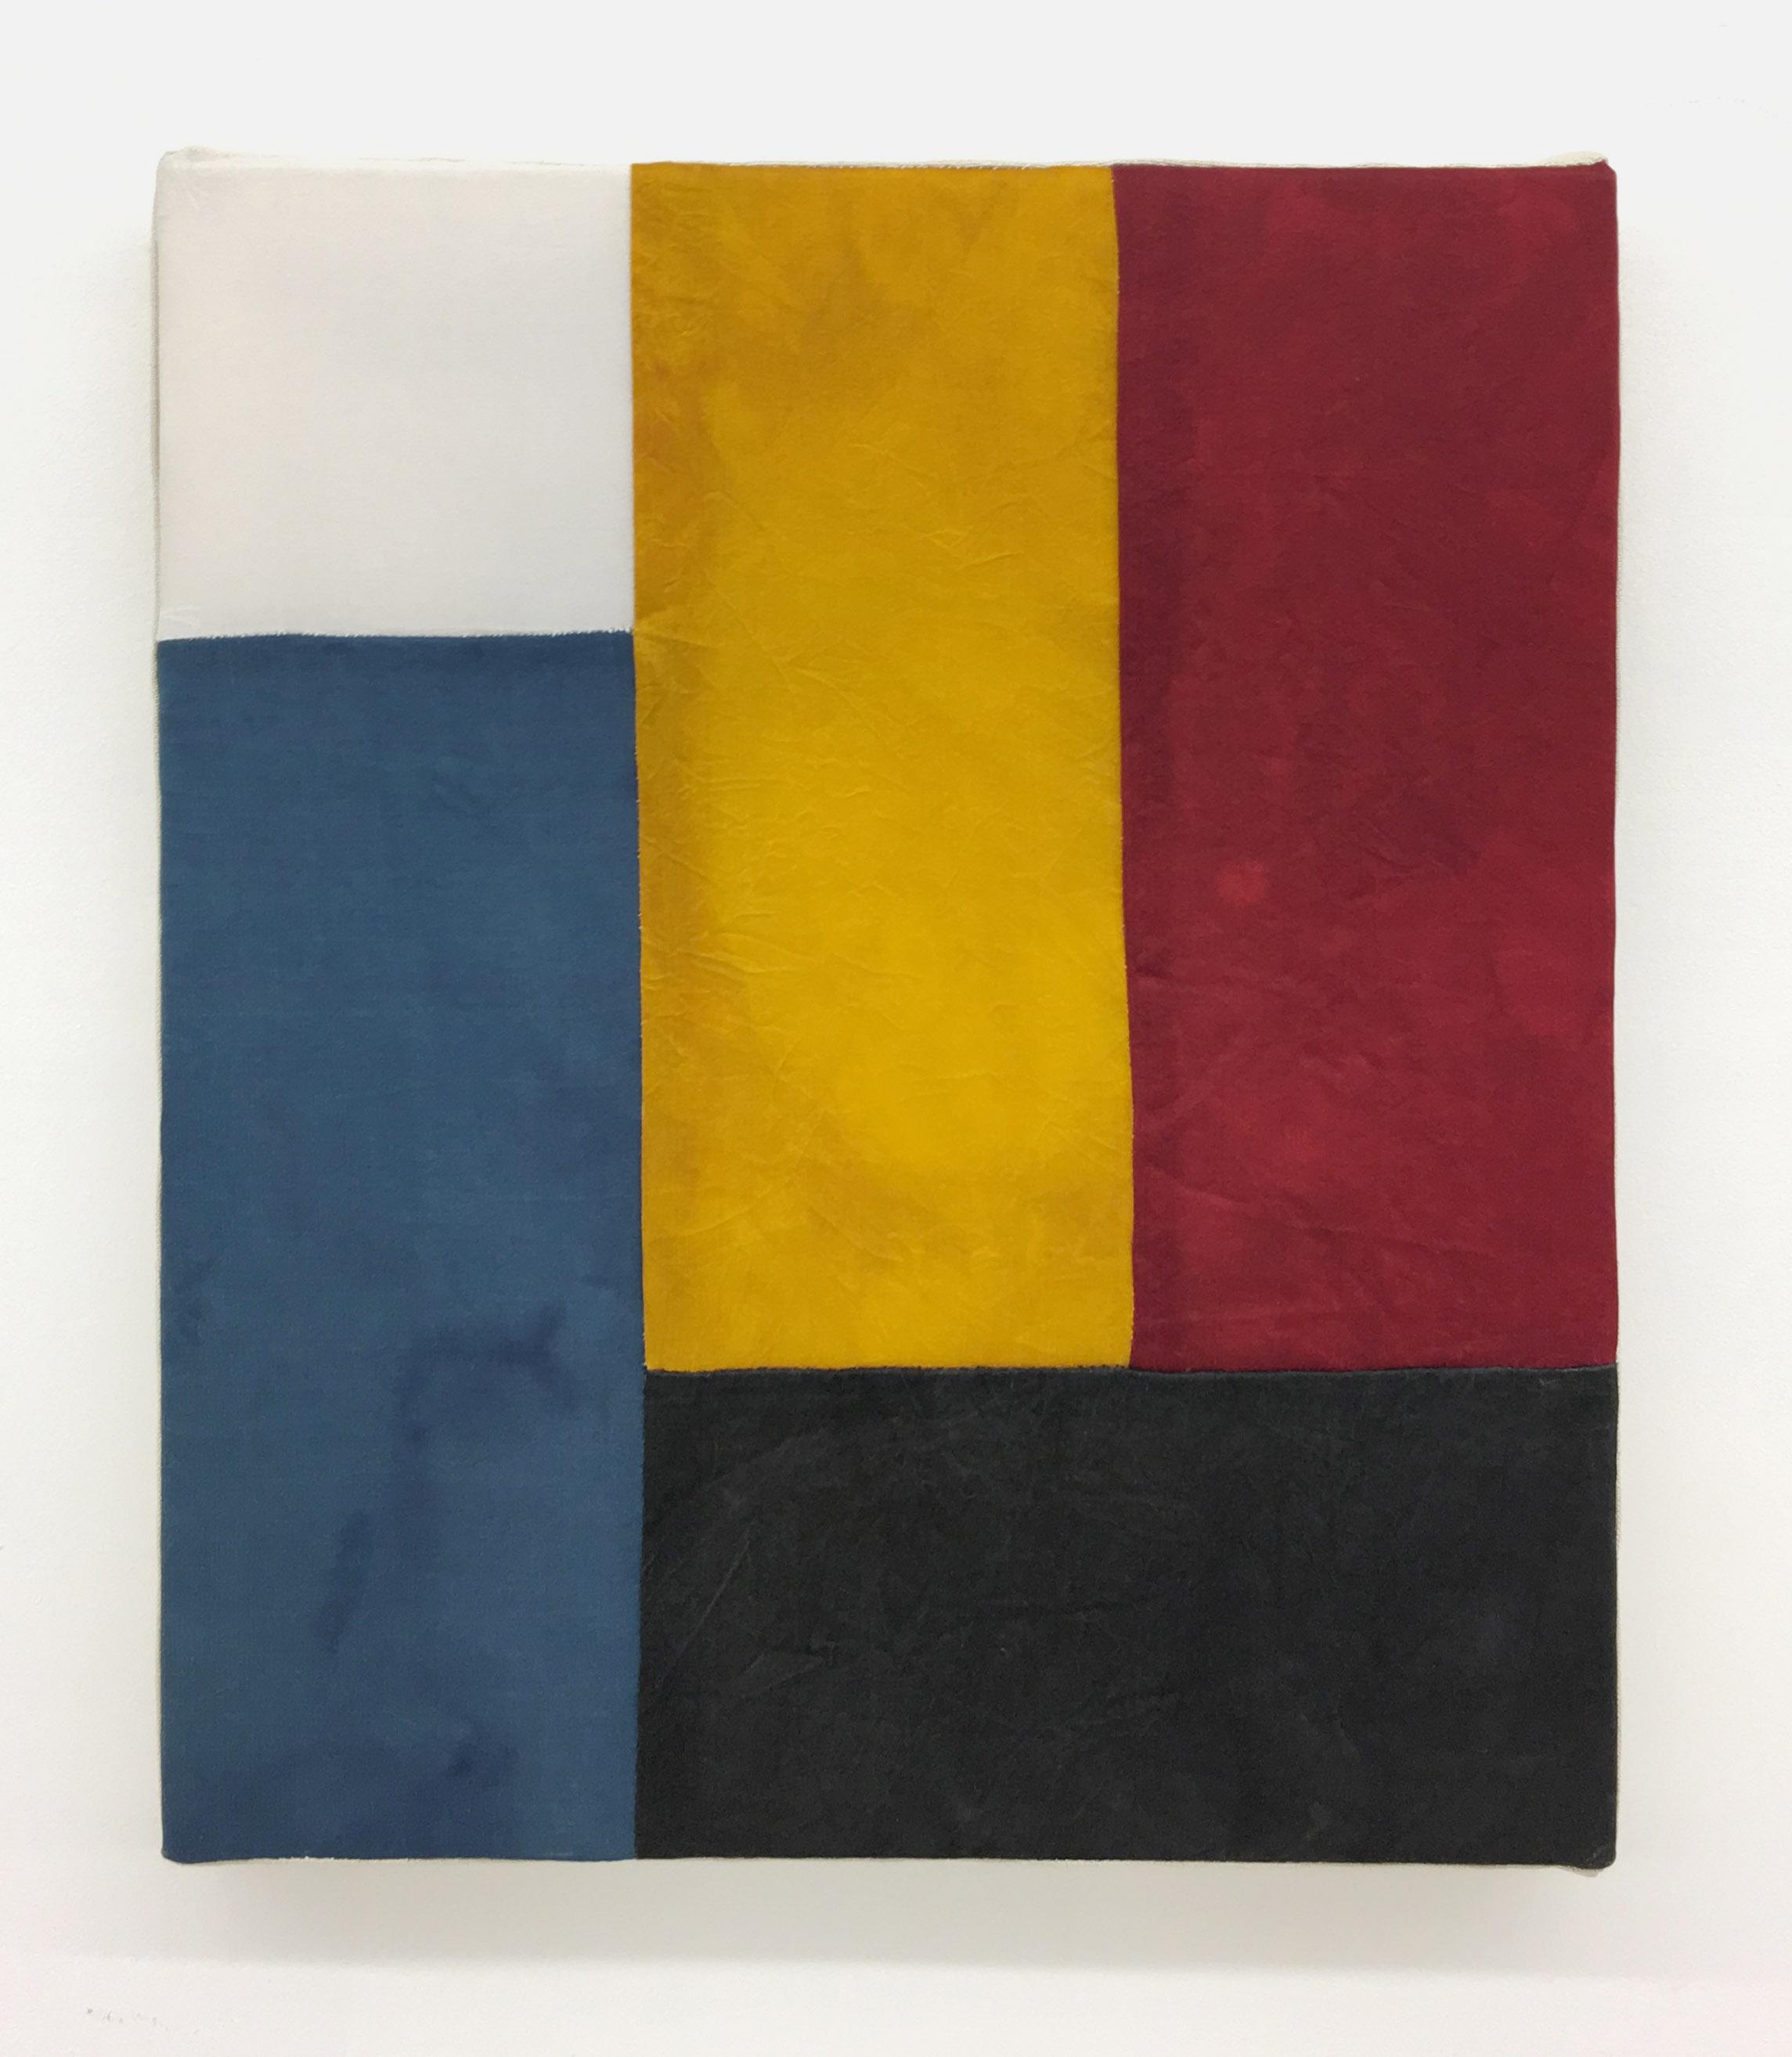 Byron Kim, Bulbokjang #1, 2016. White silk and silk dyed with charcoal, gardenia, indigo and sandalwood,14 x 12 in. (35.6 x 30.5 cm). Courtesy James Cohan